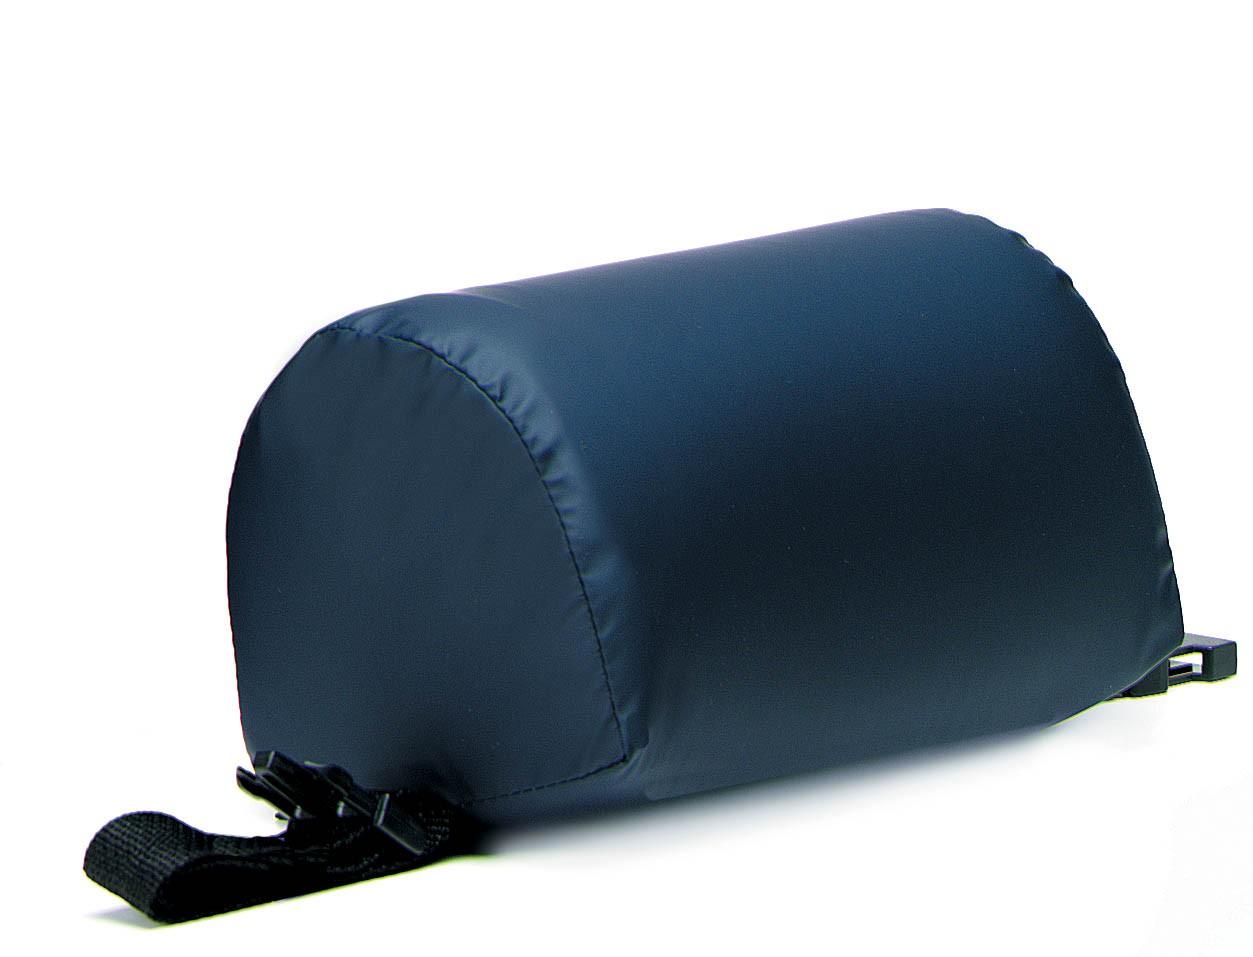 Dental Chair Overlay Headrest With Memory Foam Comfort Supreme